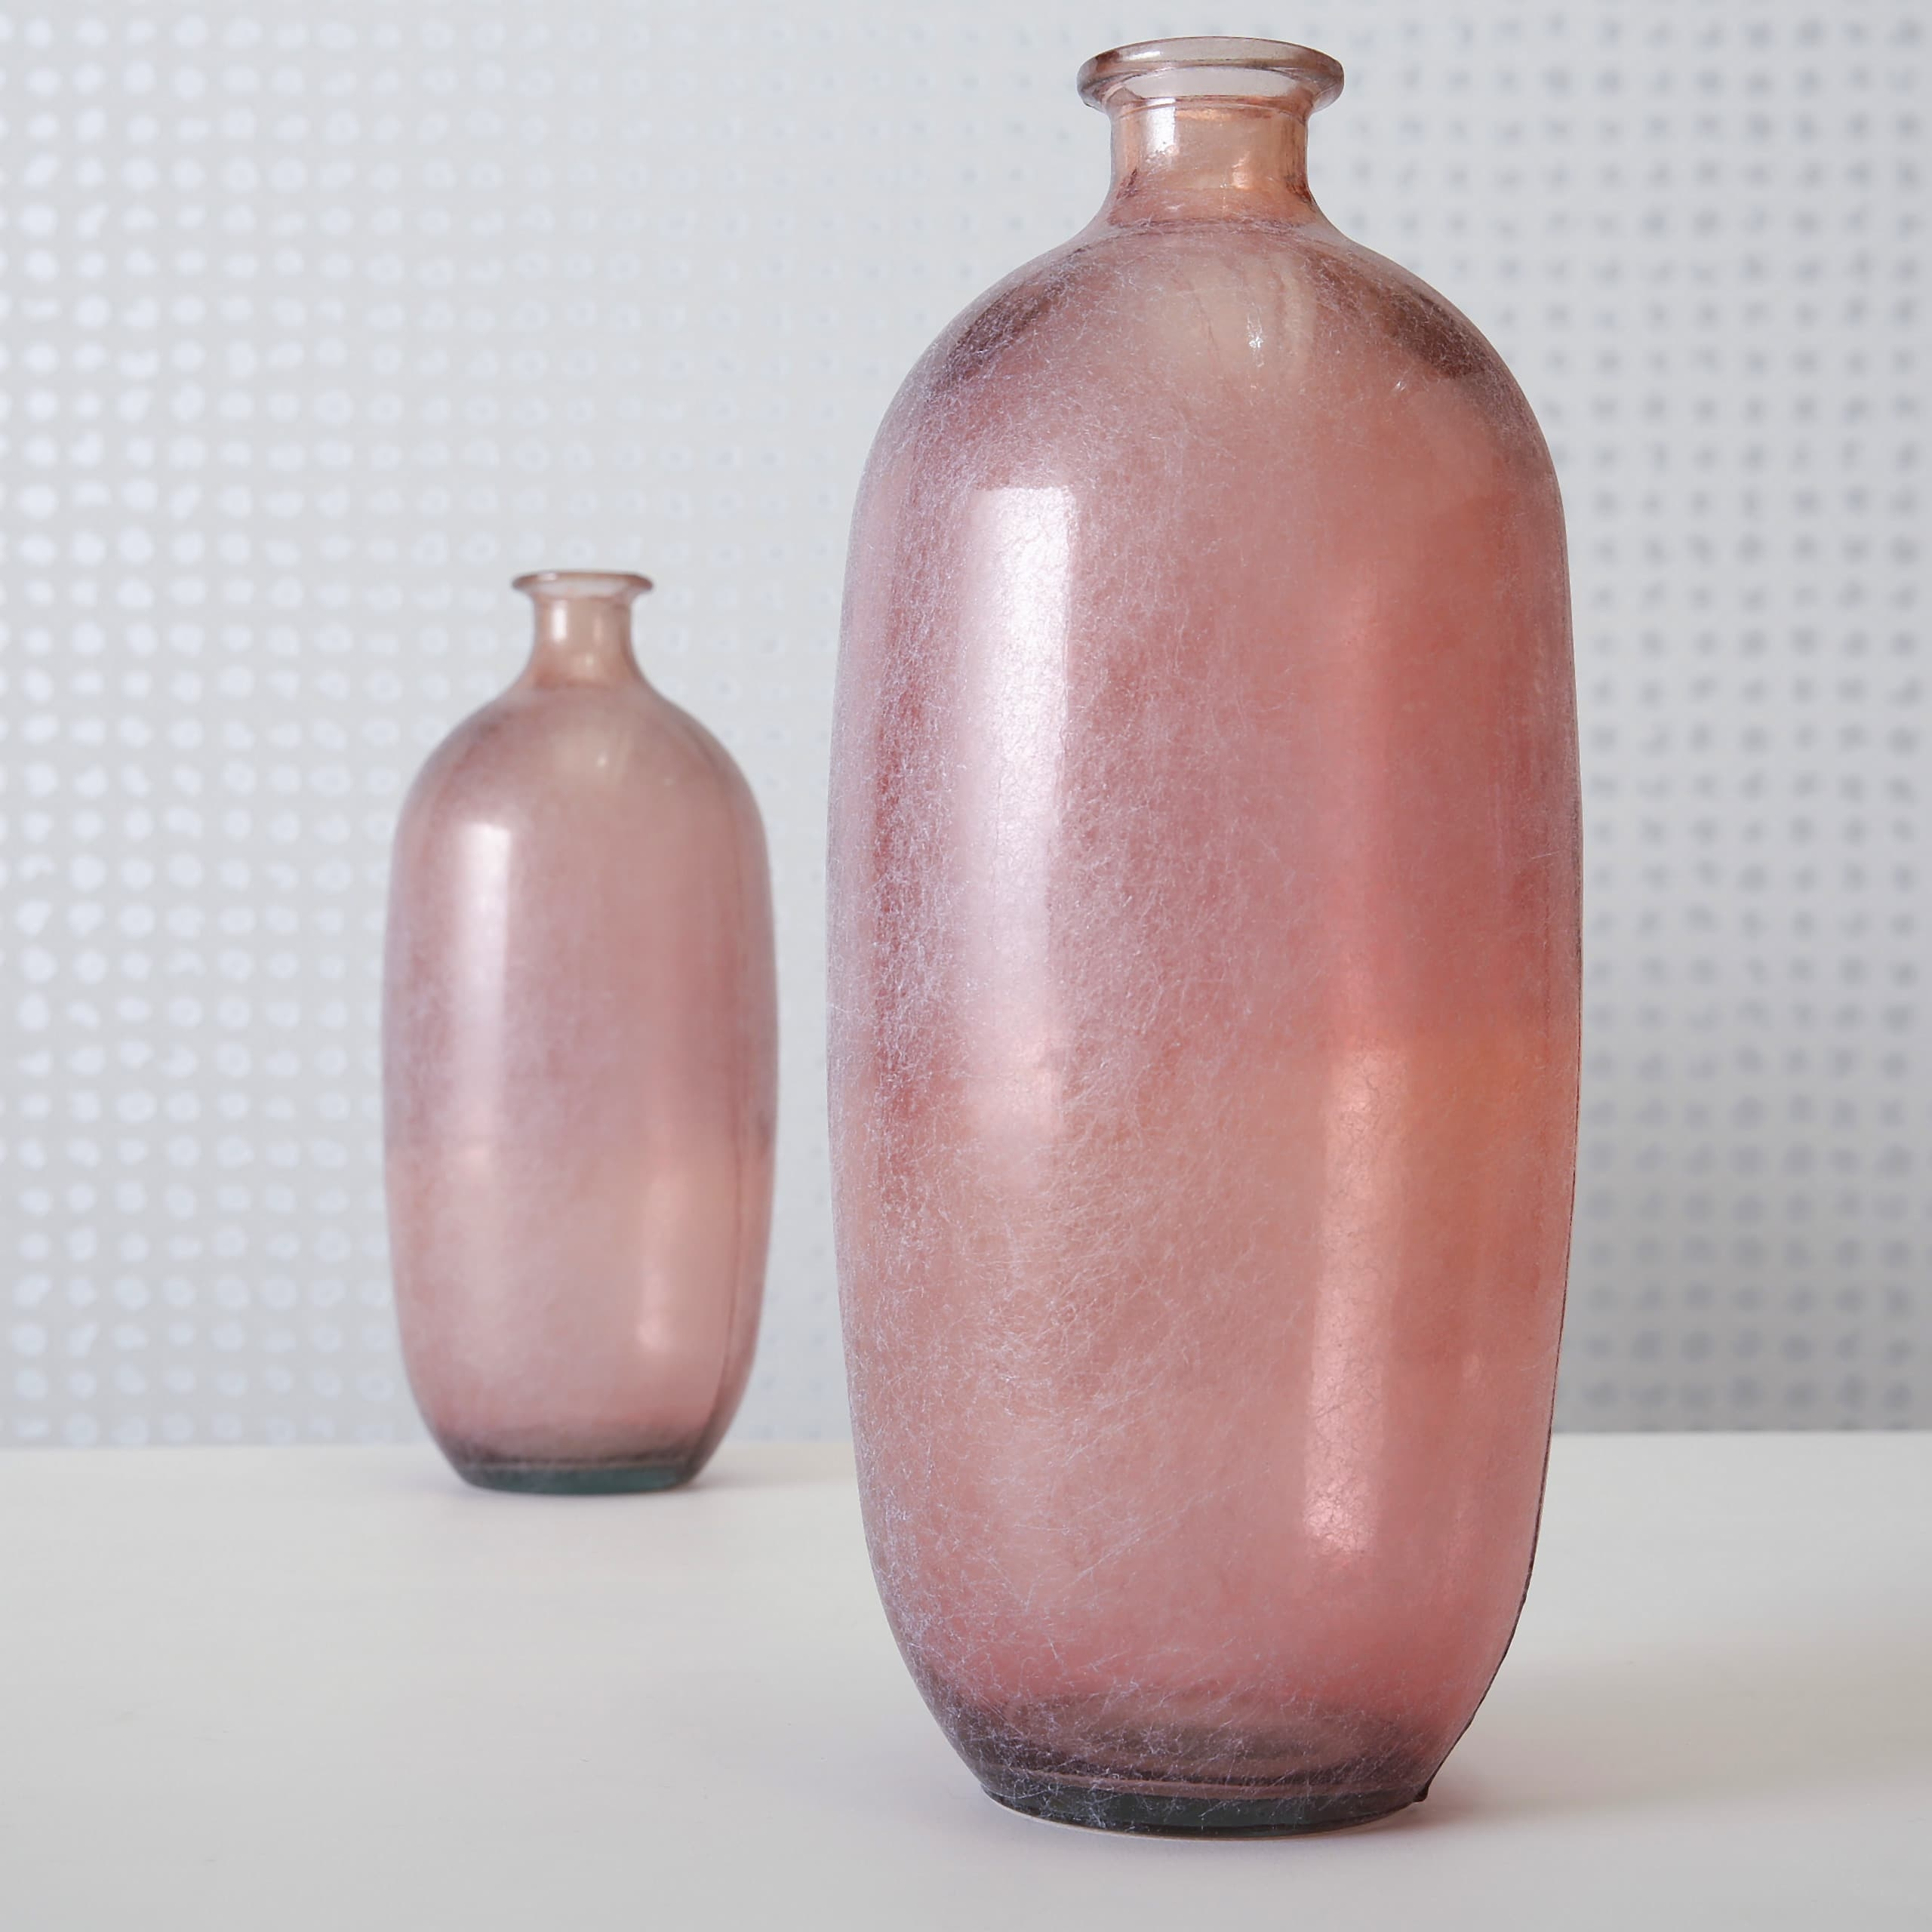 Vaza decorativa din sticla reciclata Alicia Big Roz, Ø19xH45 cm